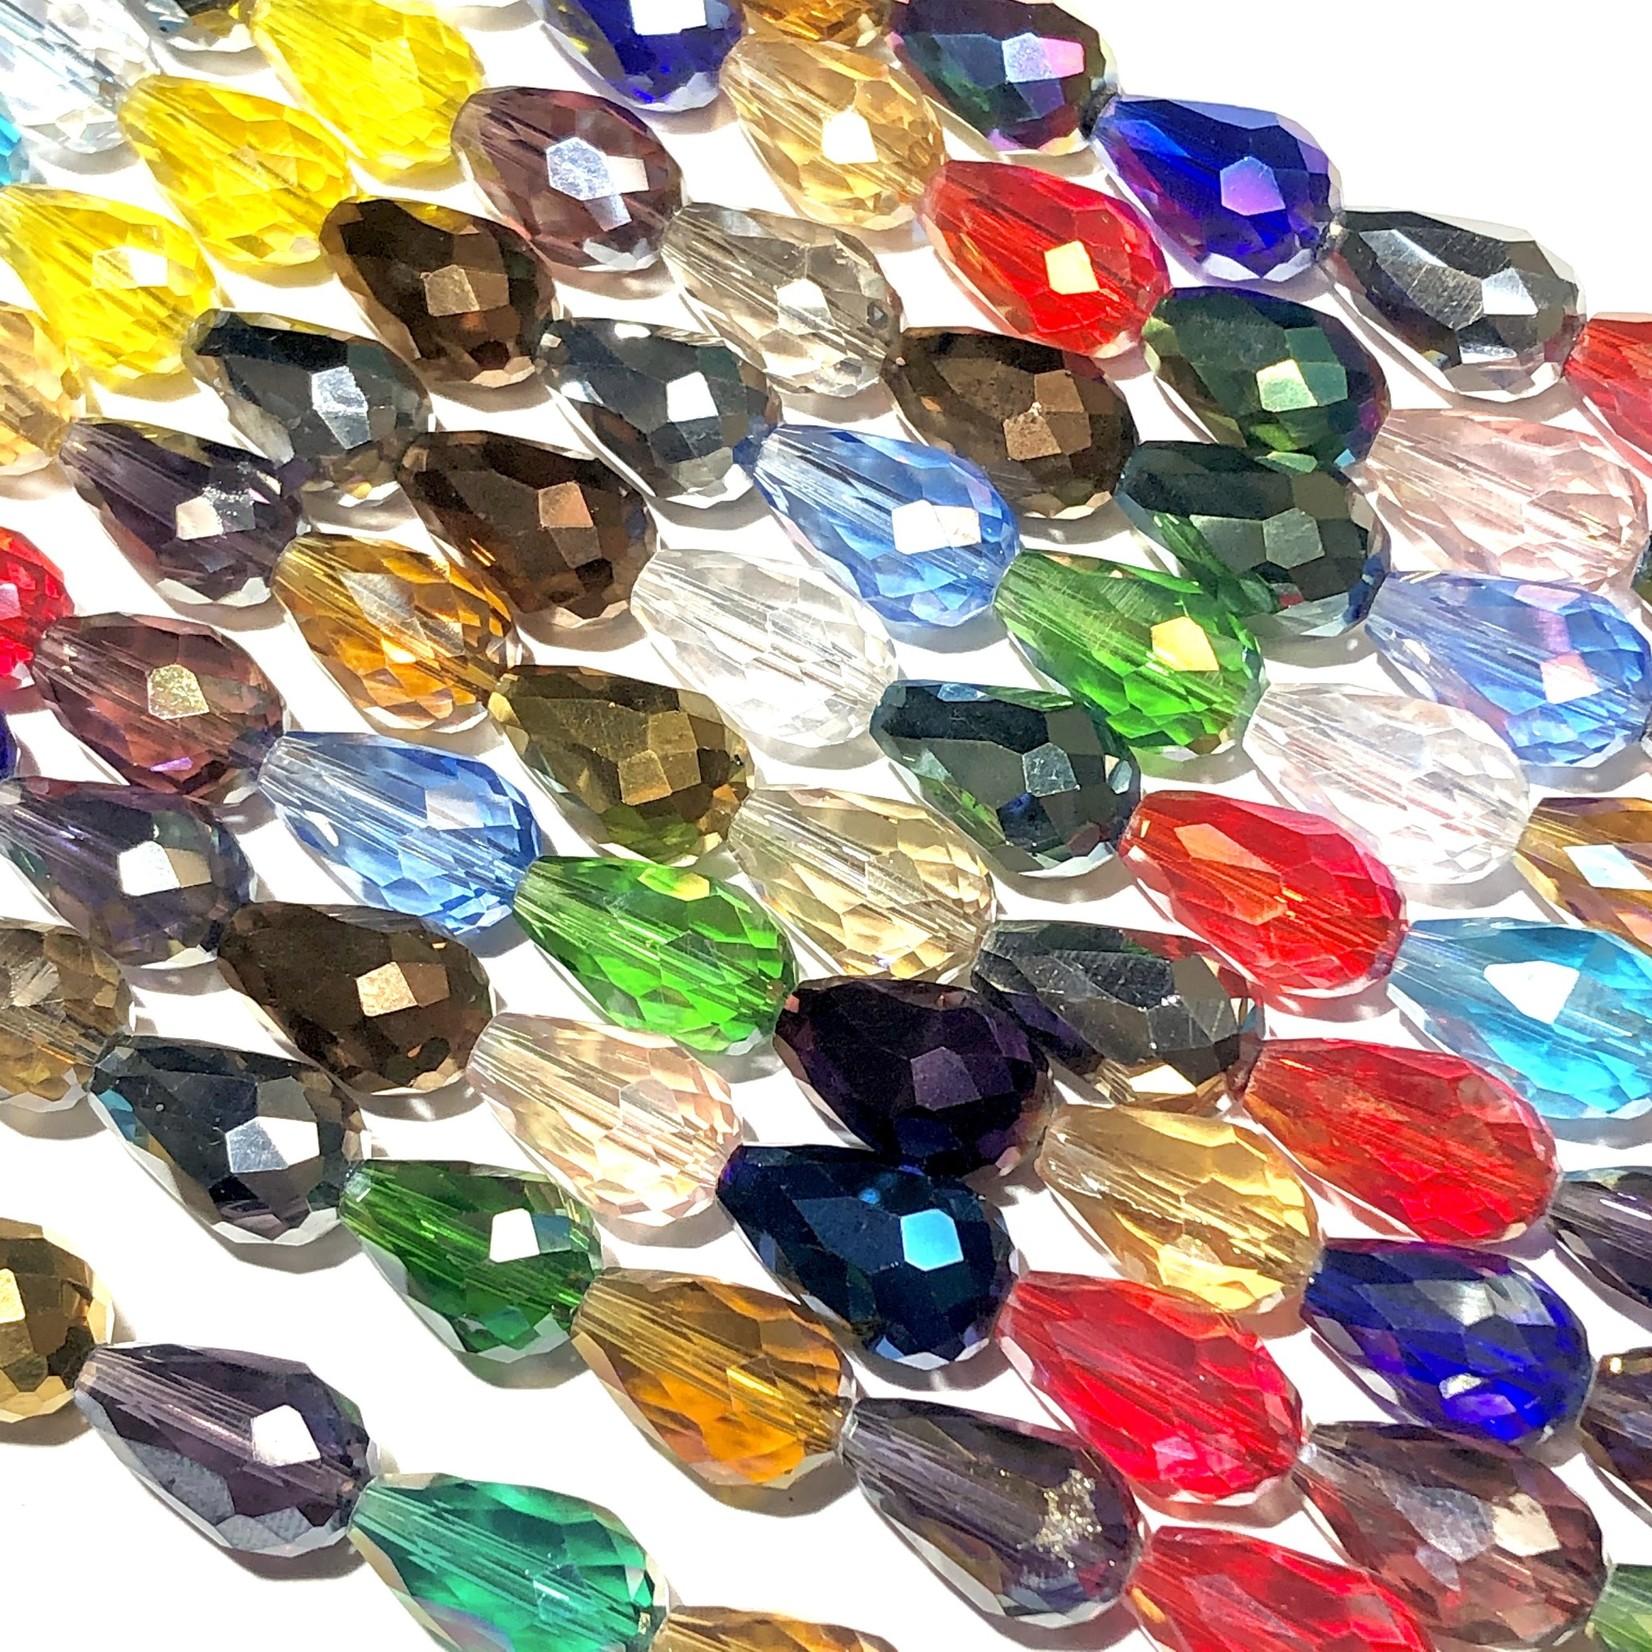 Electroplated GLASS Faceted Drop Asst'd 15X10mm